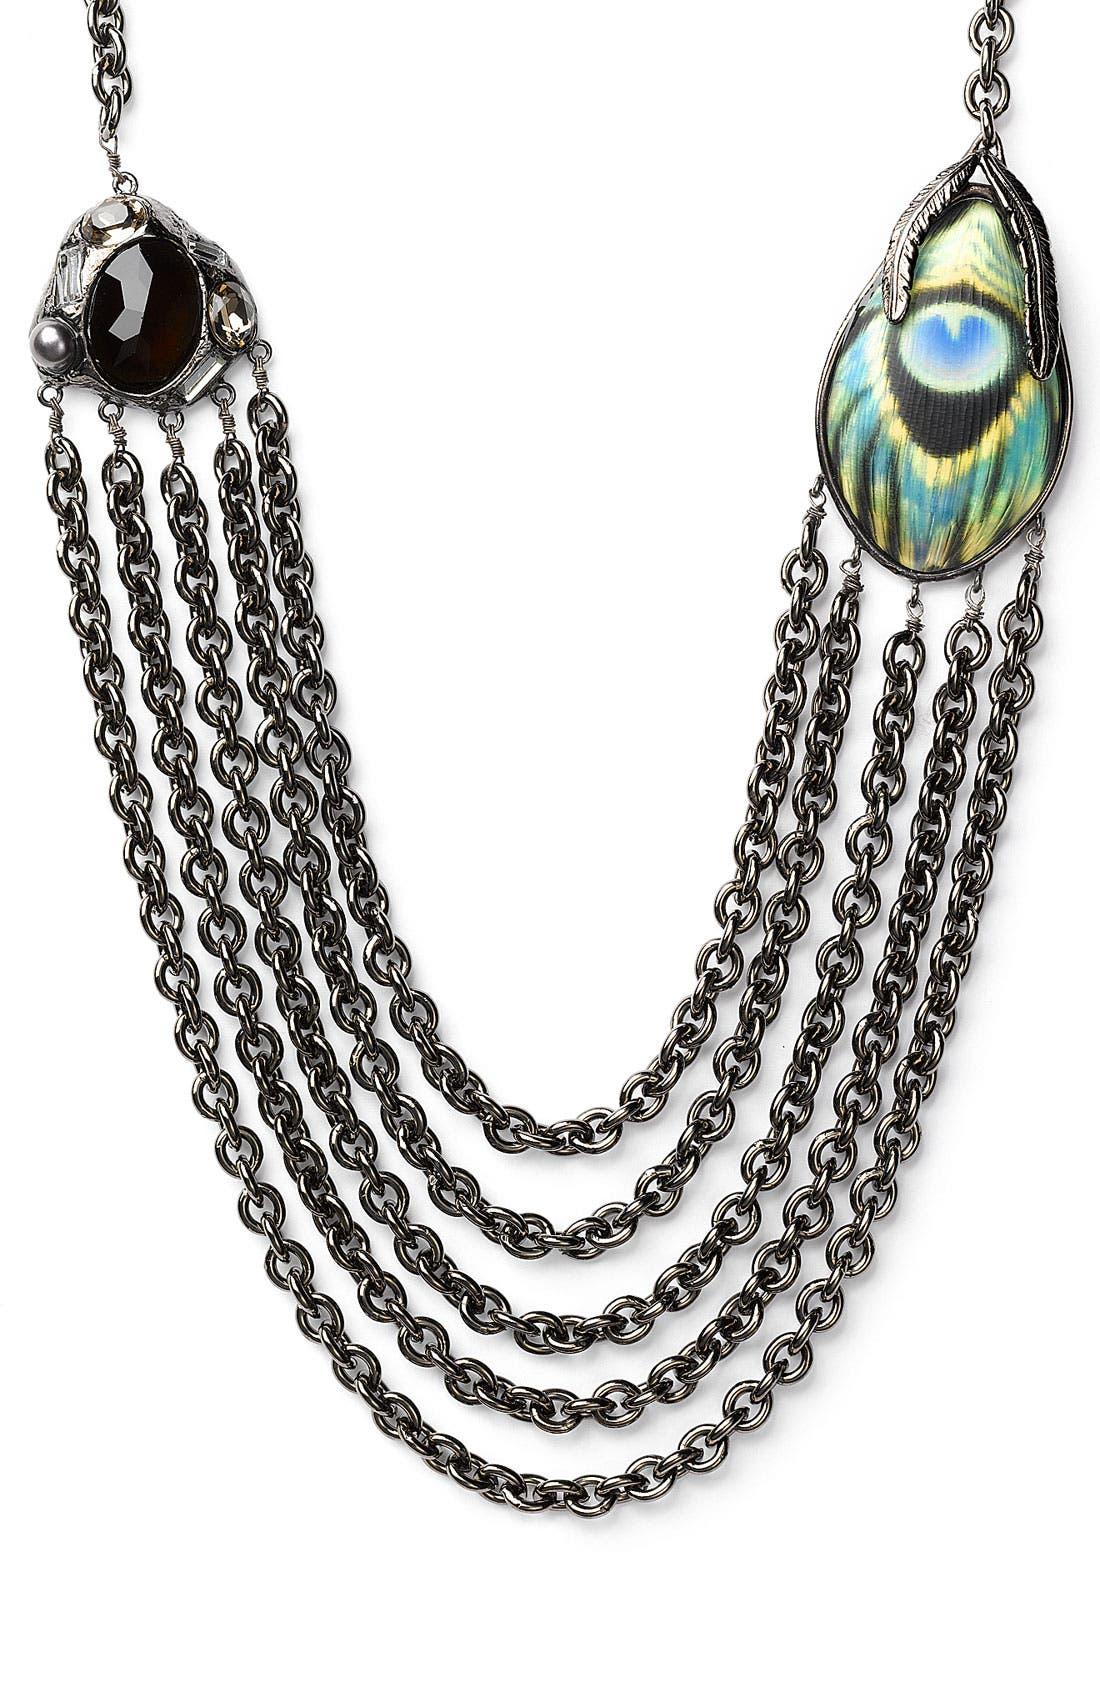 Main Image - Alexis Bittar 'Alexandria' Multistrand Necklace (Nordstrom Exclusive)